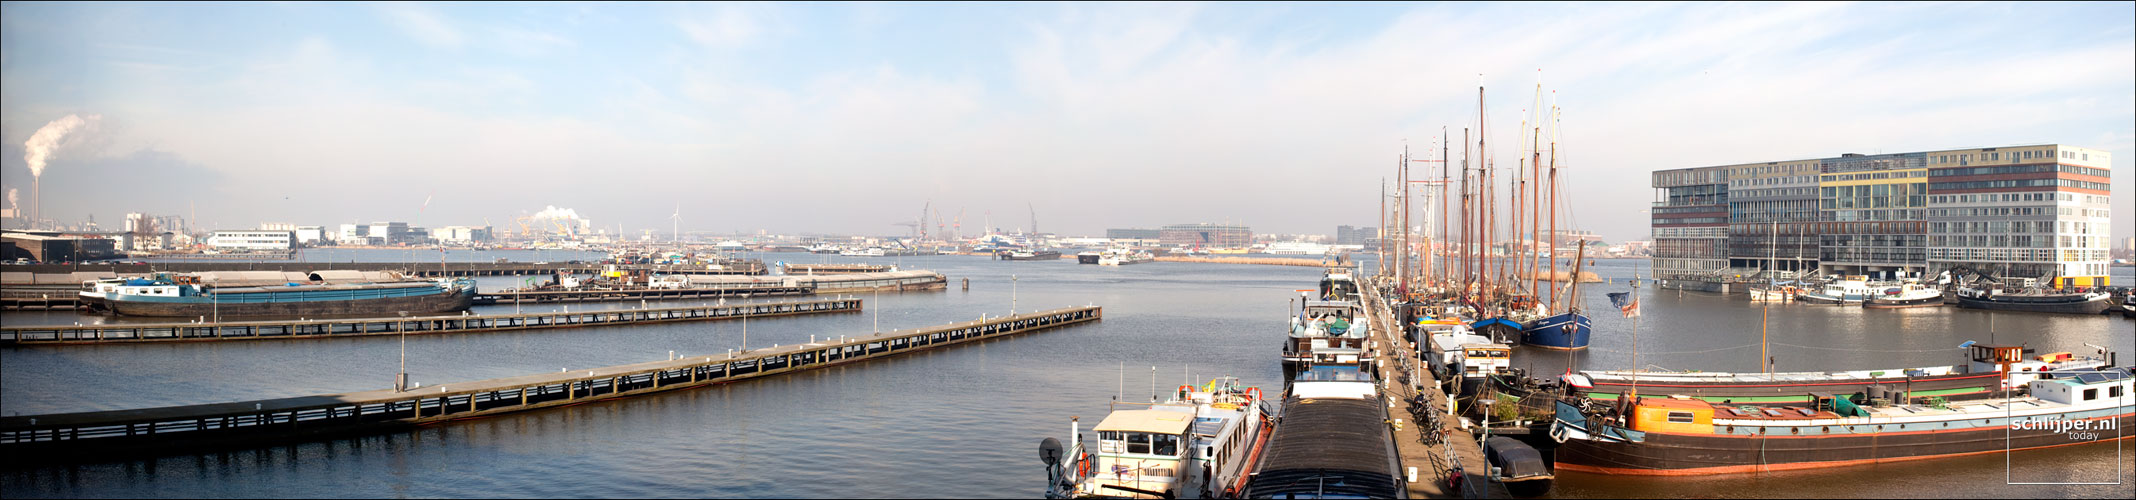 Nederland, Amsterdam, 22 februari 2011